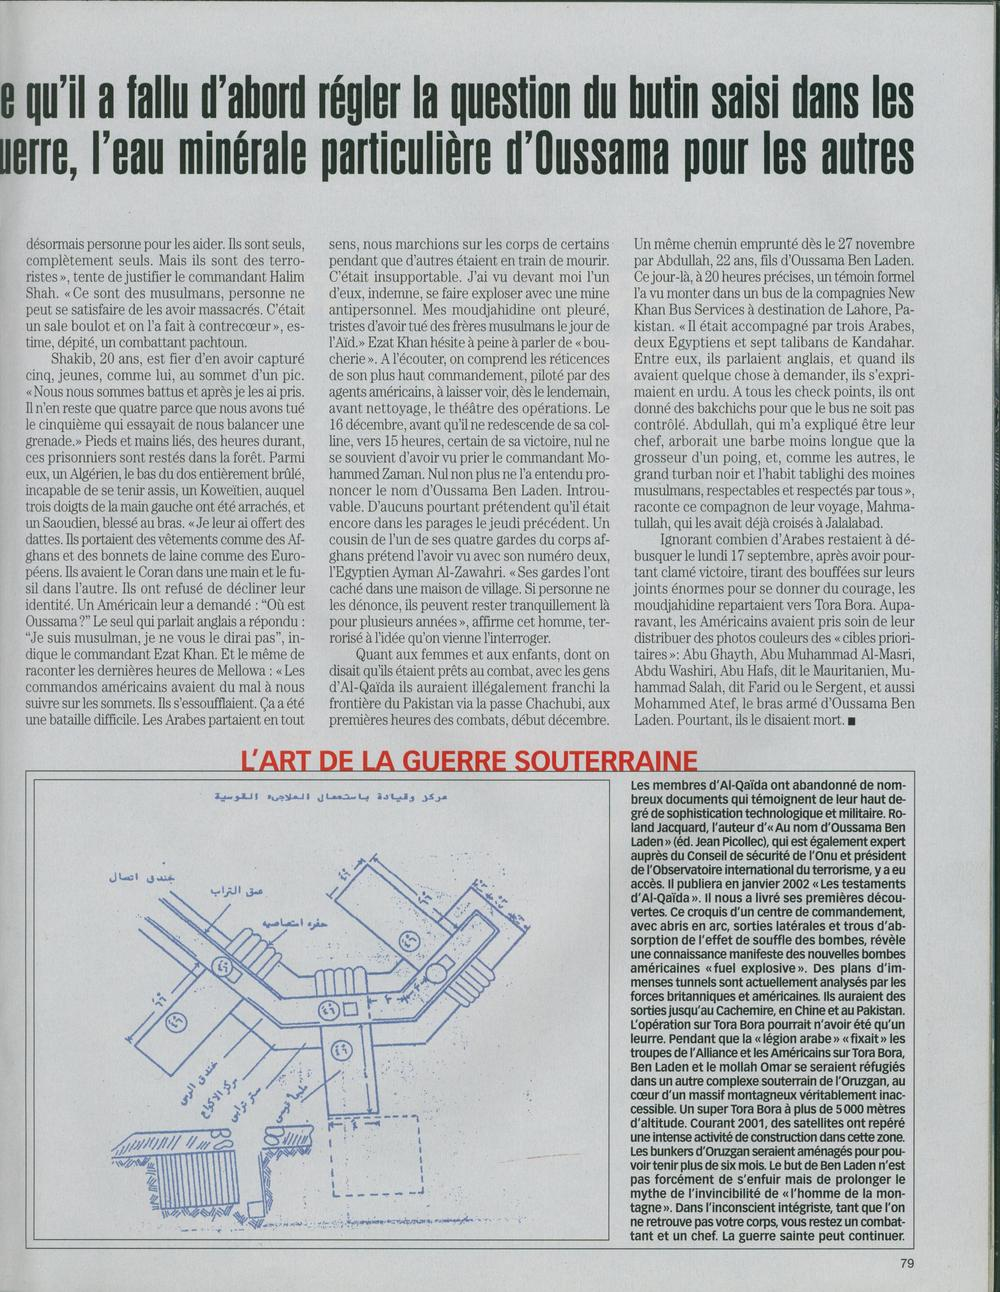 12272001_PARIS MATCH_AFGHANISTAN0004.jpg